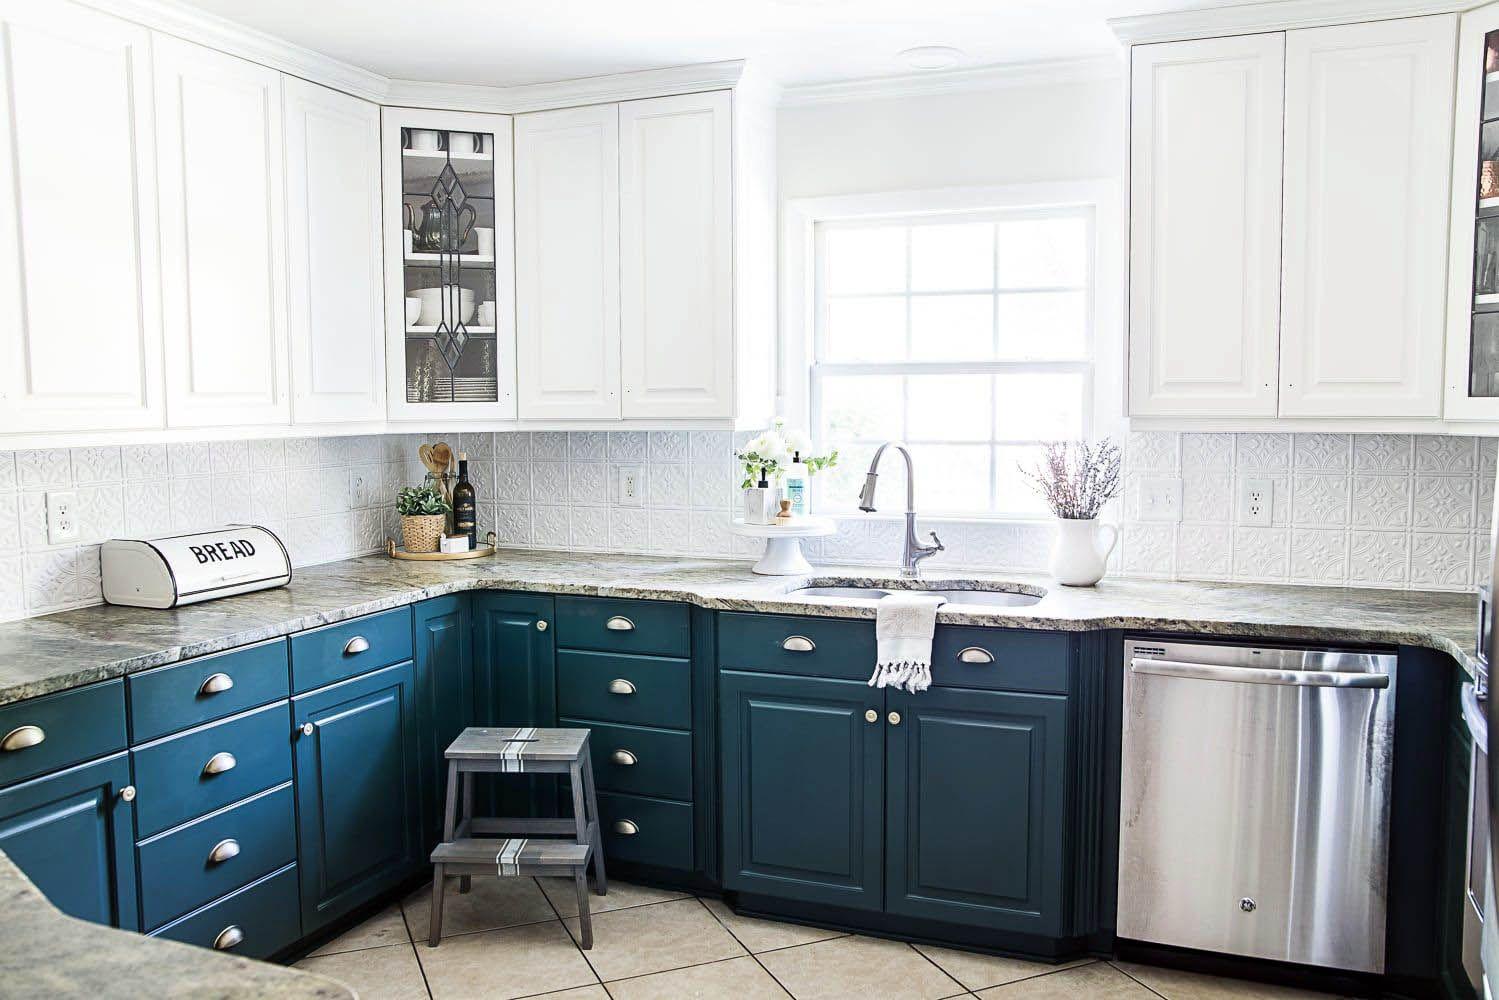 Unfamiliar 90cm kitchen doors just on homesable